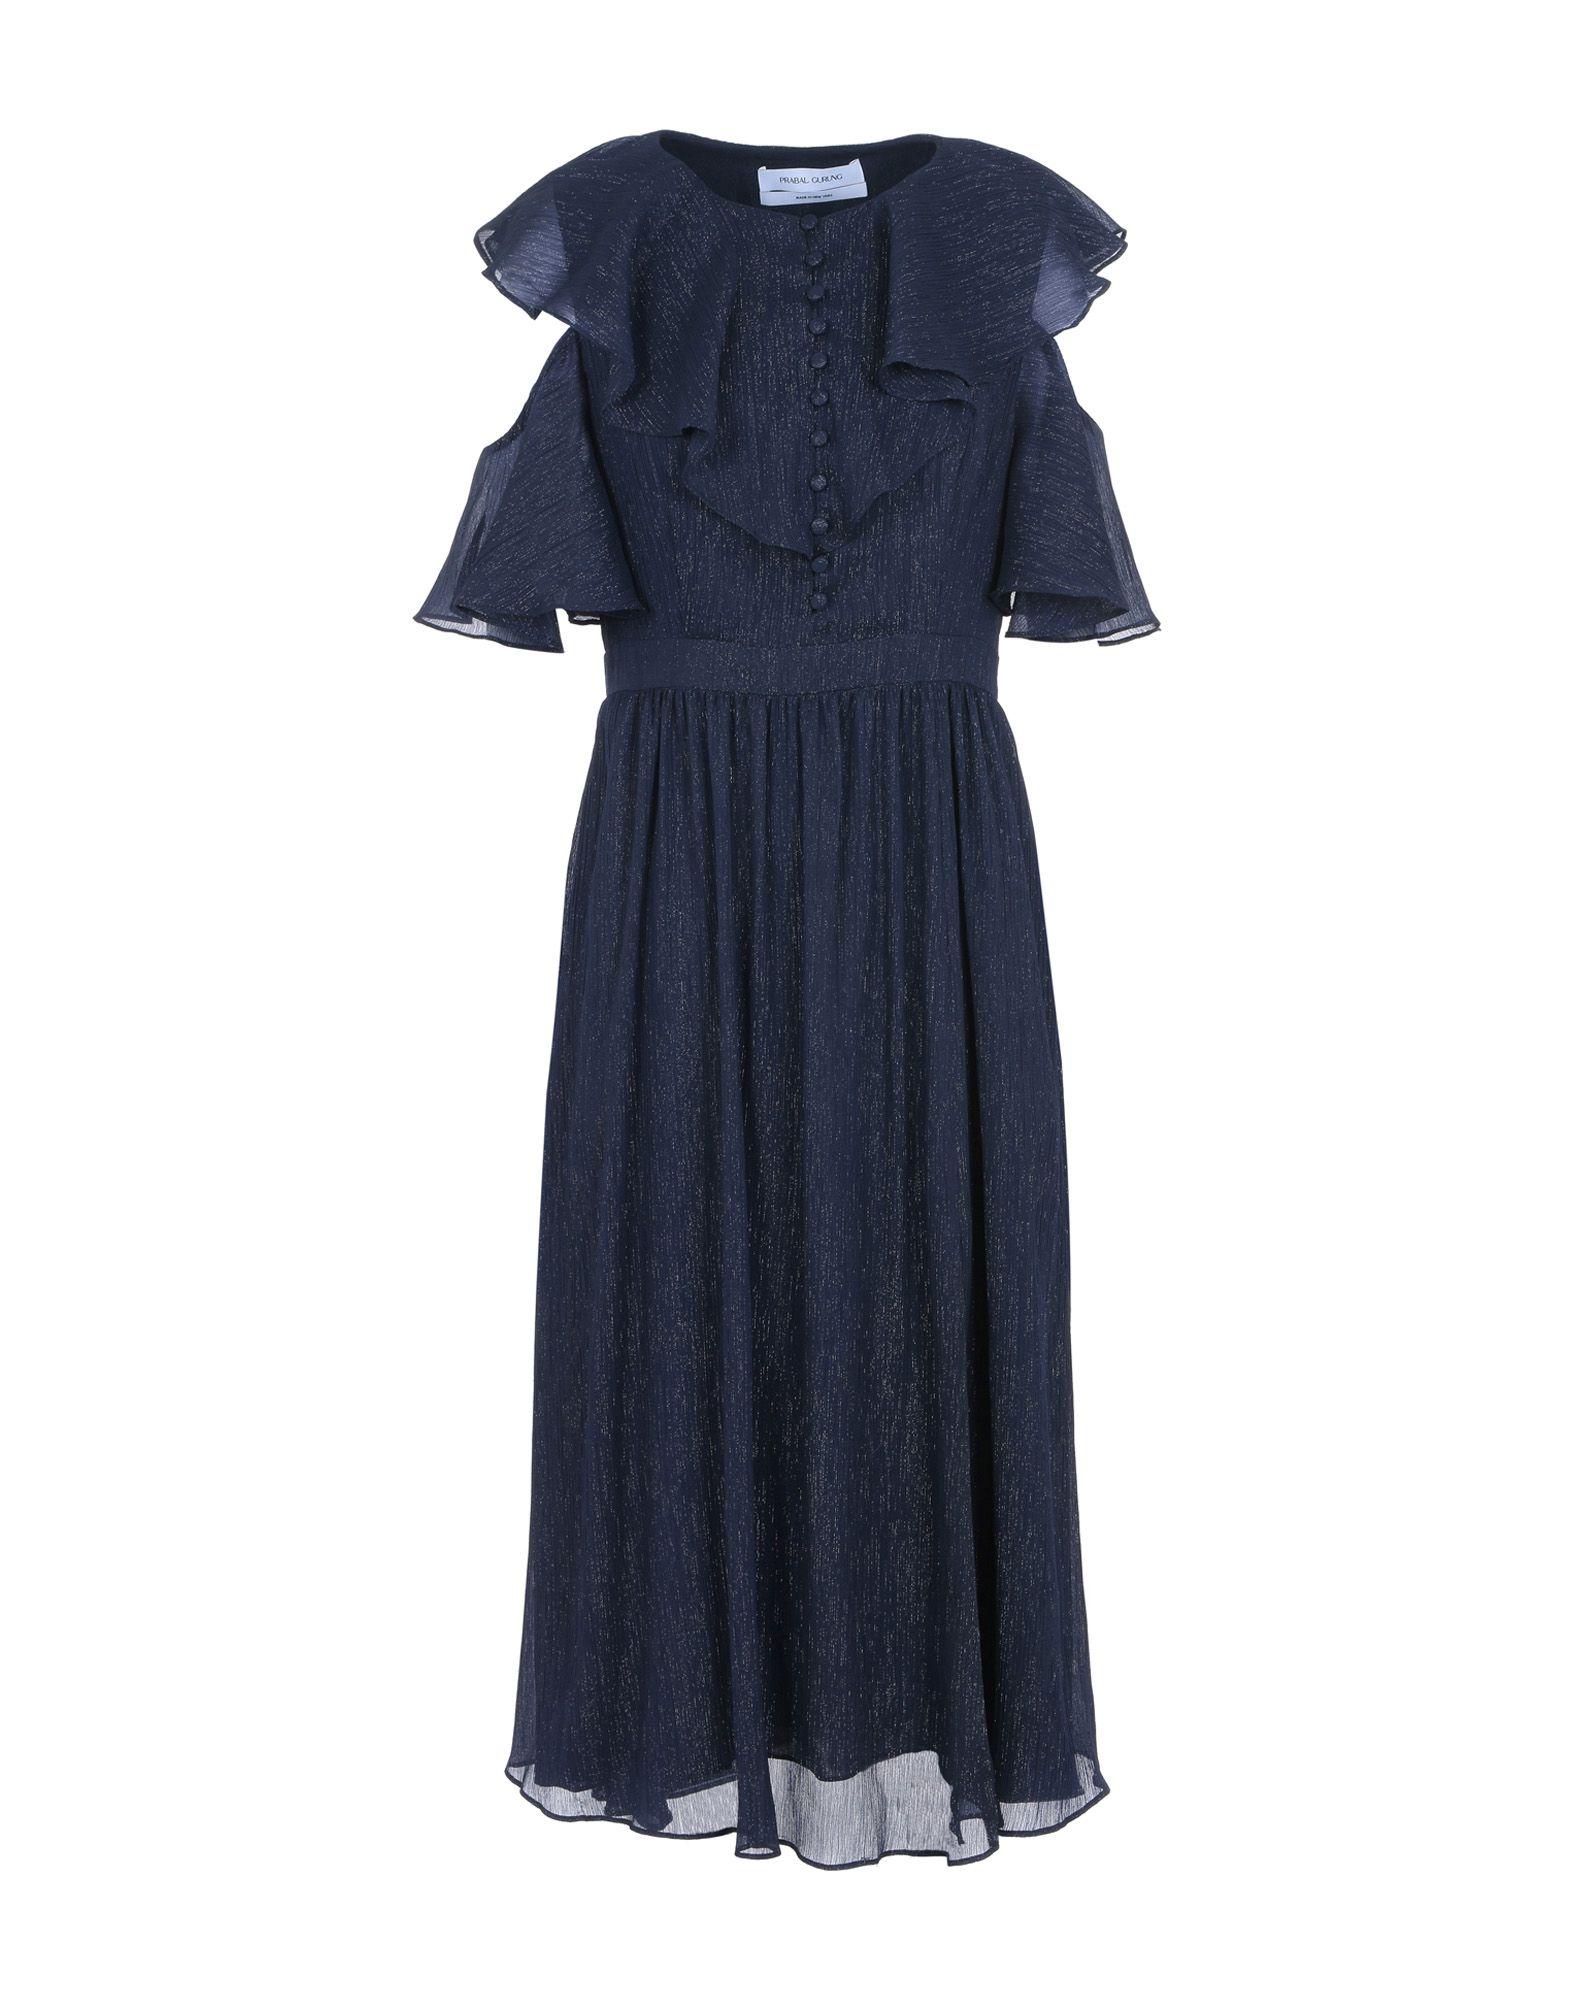 Prabal Gurung Dresses